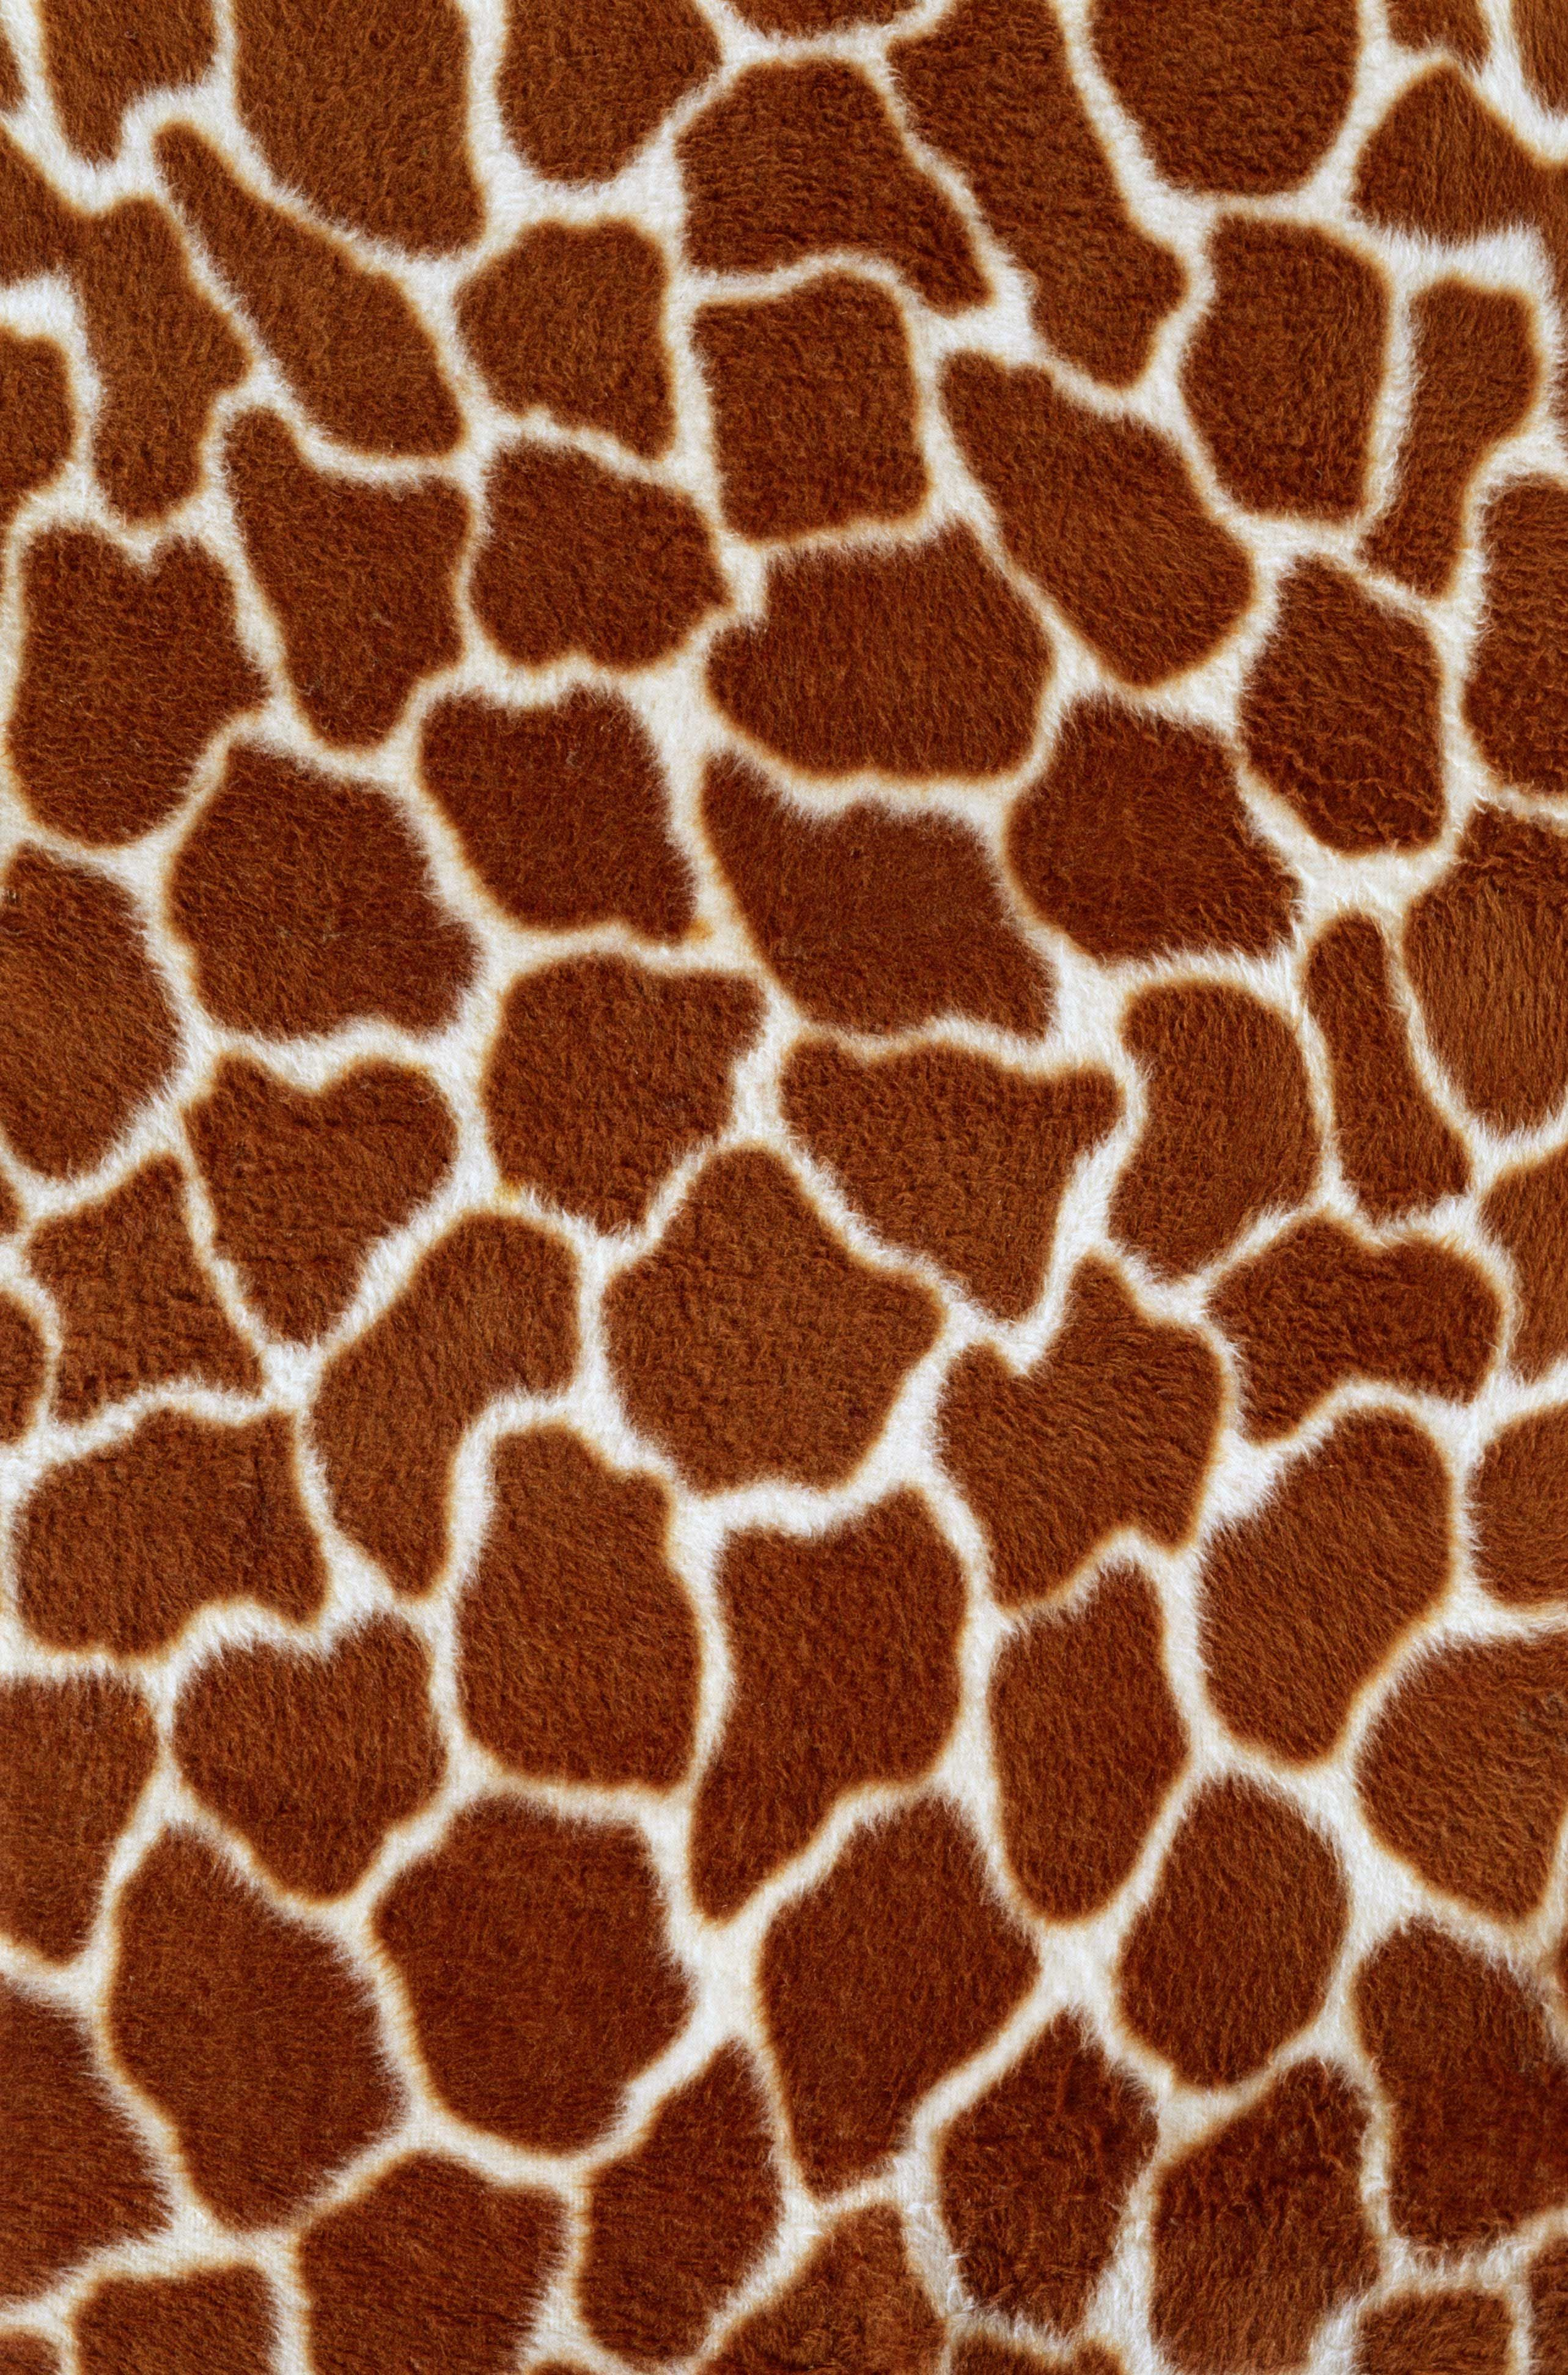 Animal Skin Texture Wallpaper Iphone Produk Animasi